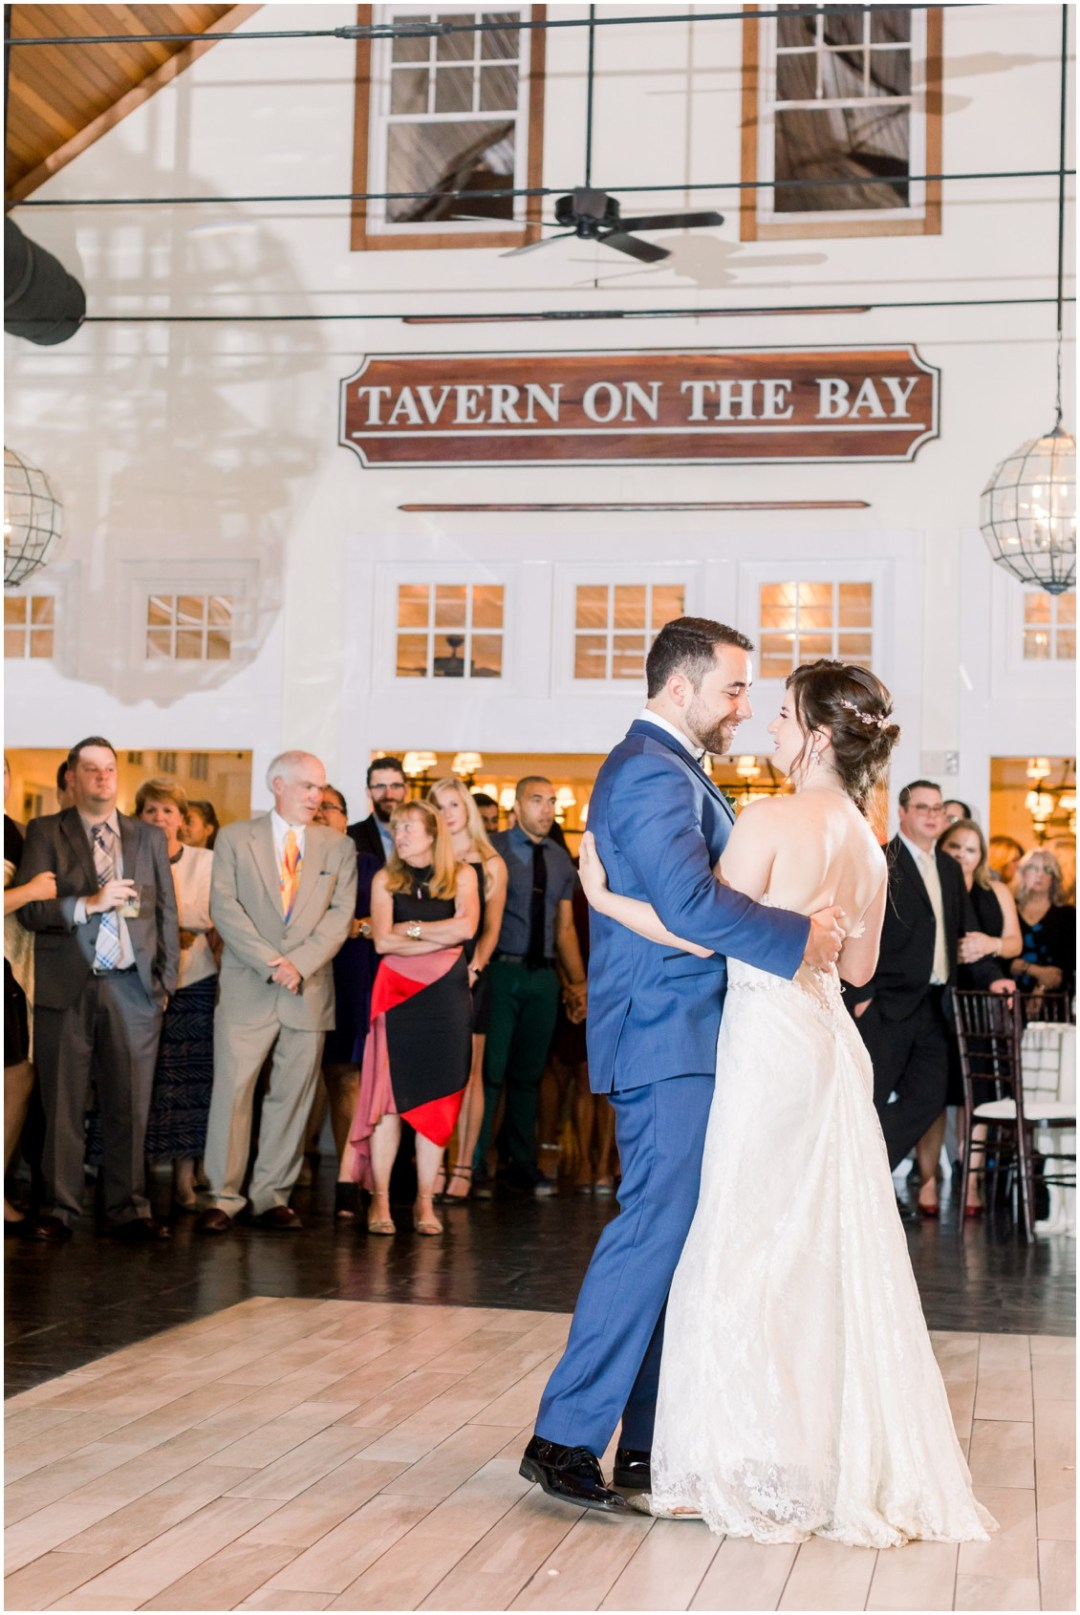 Bride and groom dancing at wedding reception at the Chesapeake Bay Beach Club. | My Eastern Shore Wedding |